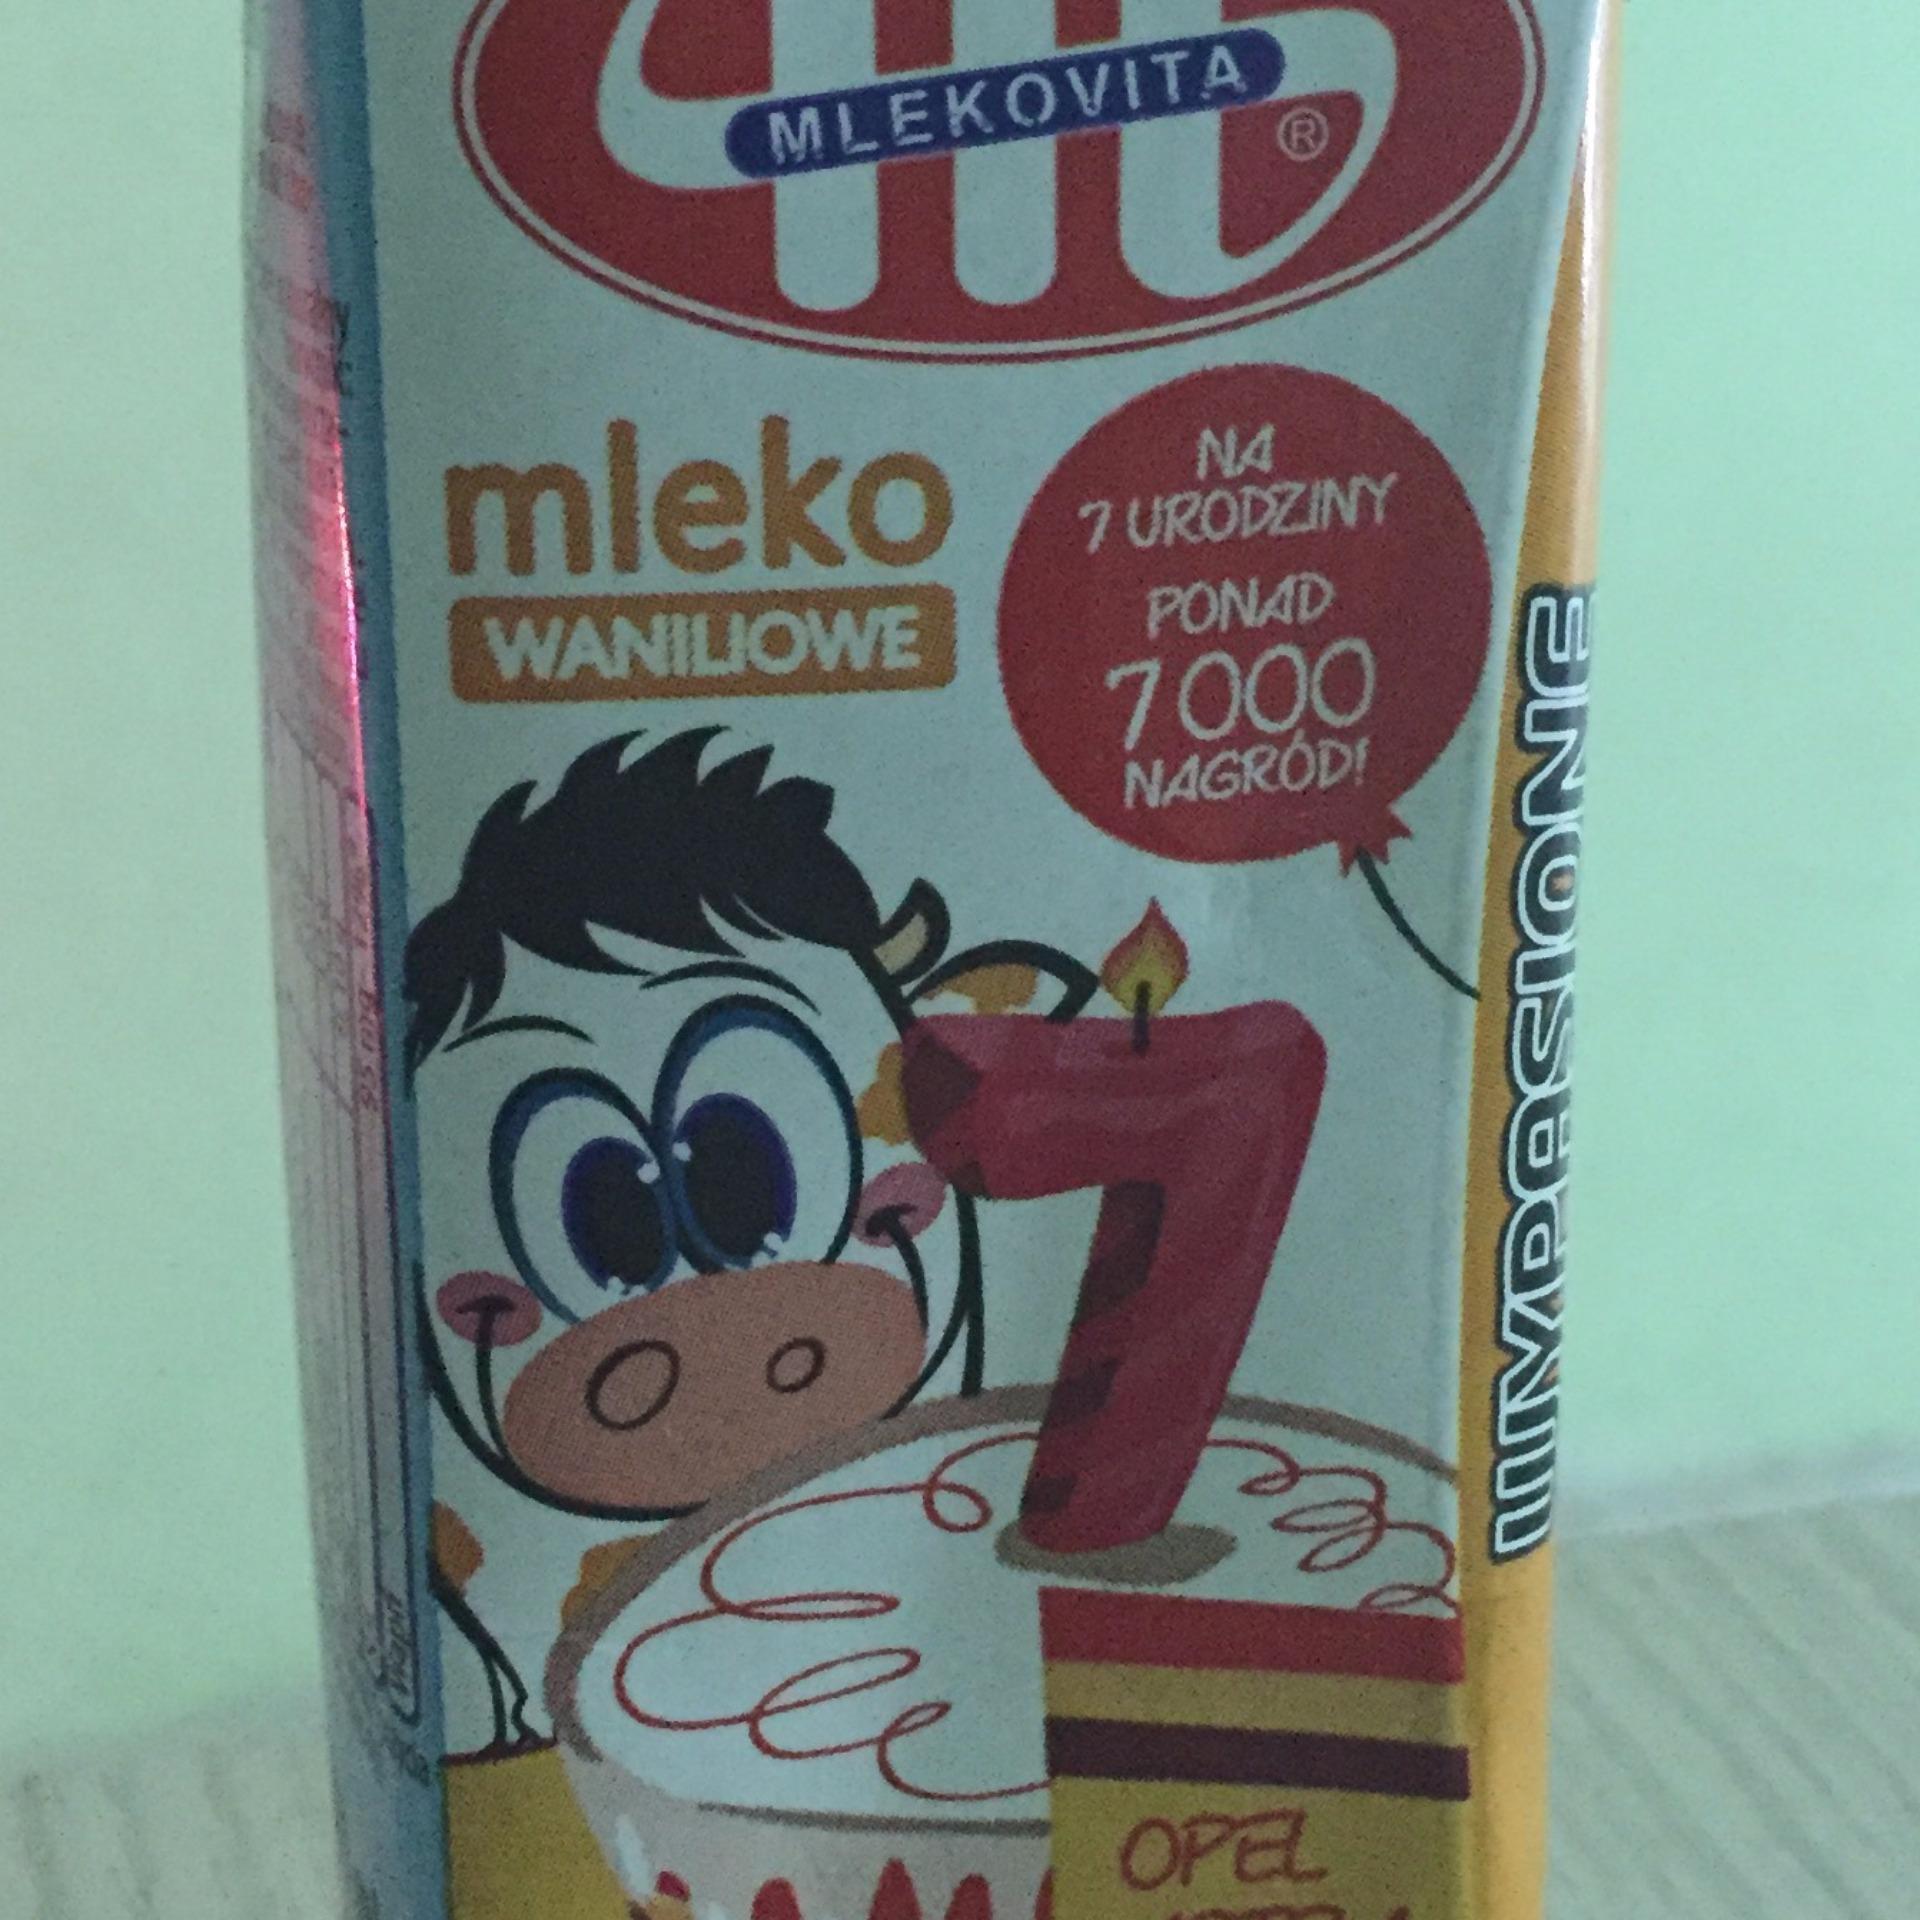 Sữa Mlekovita